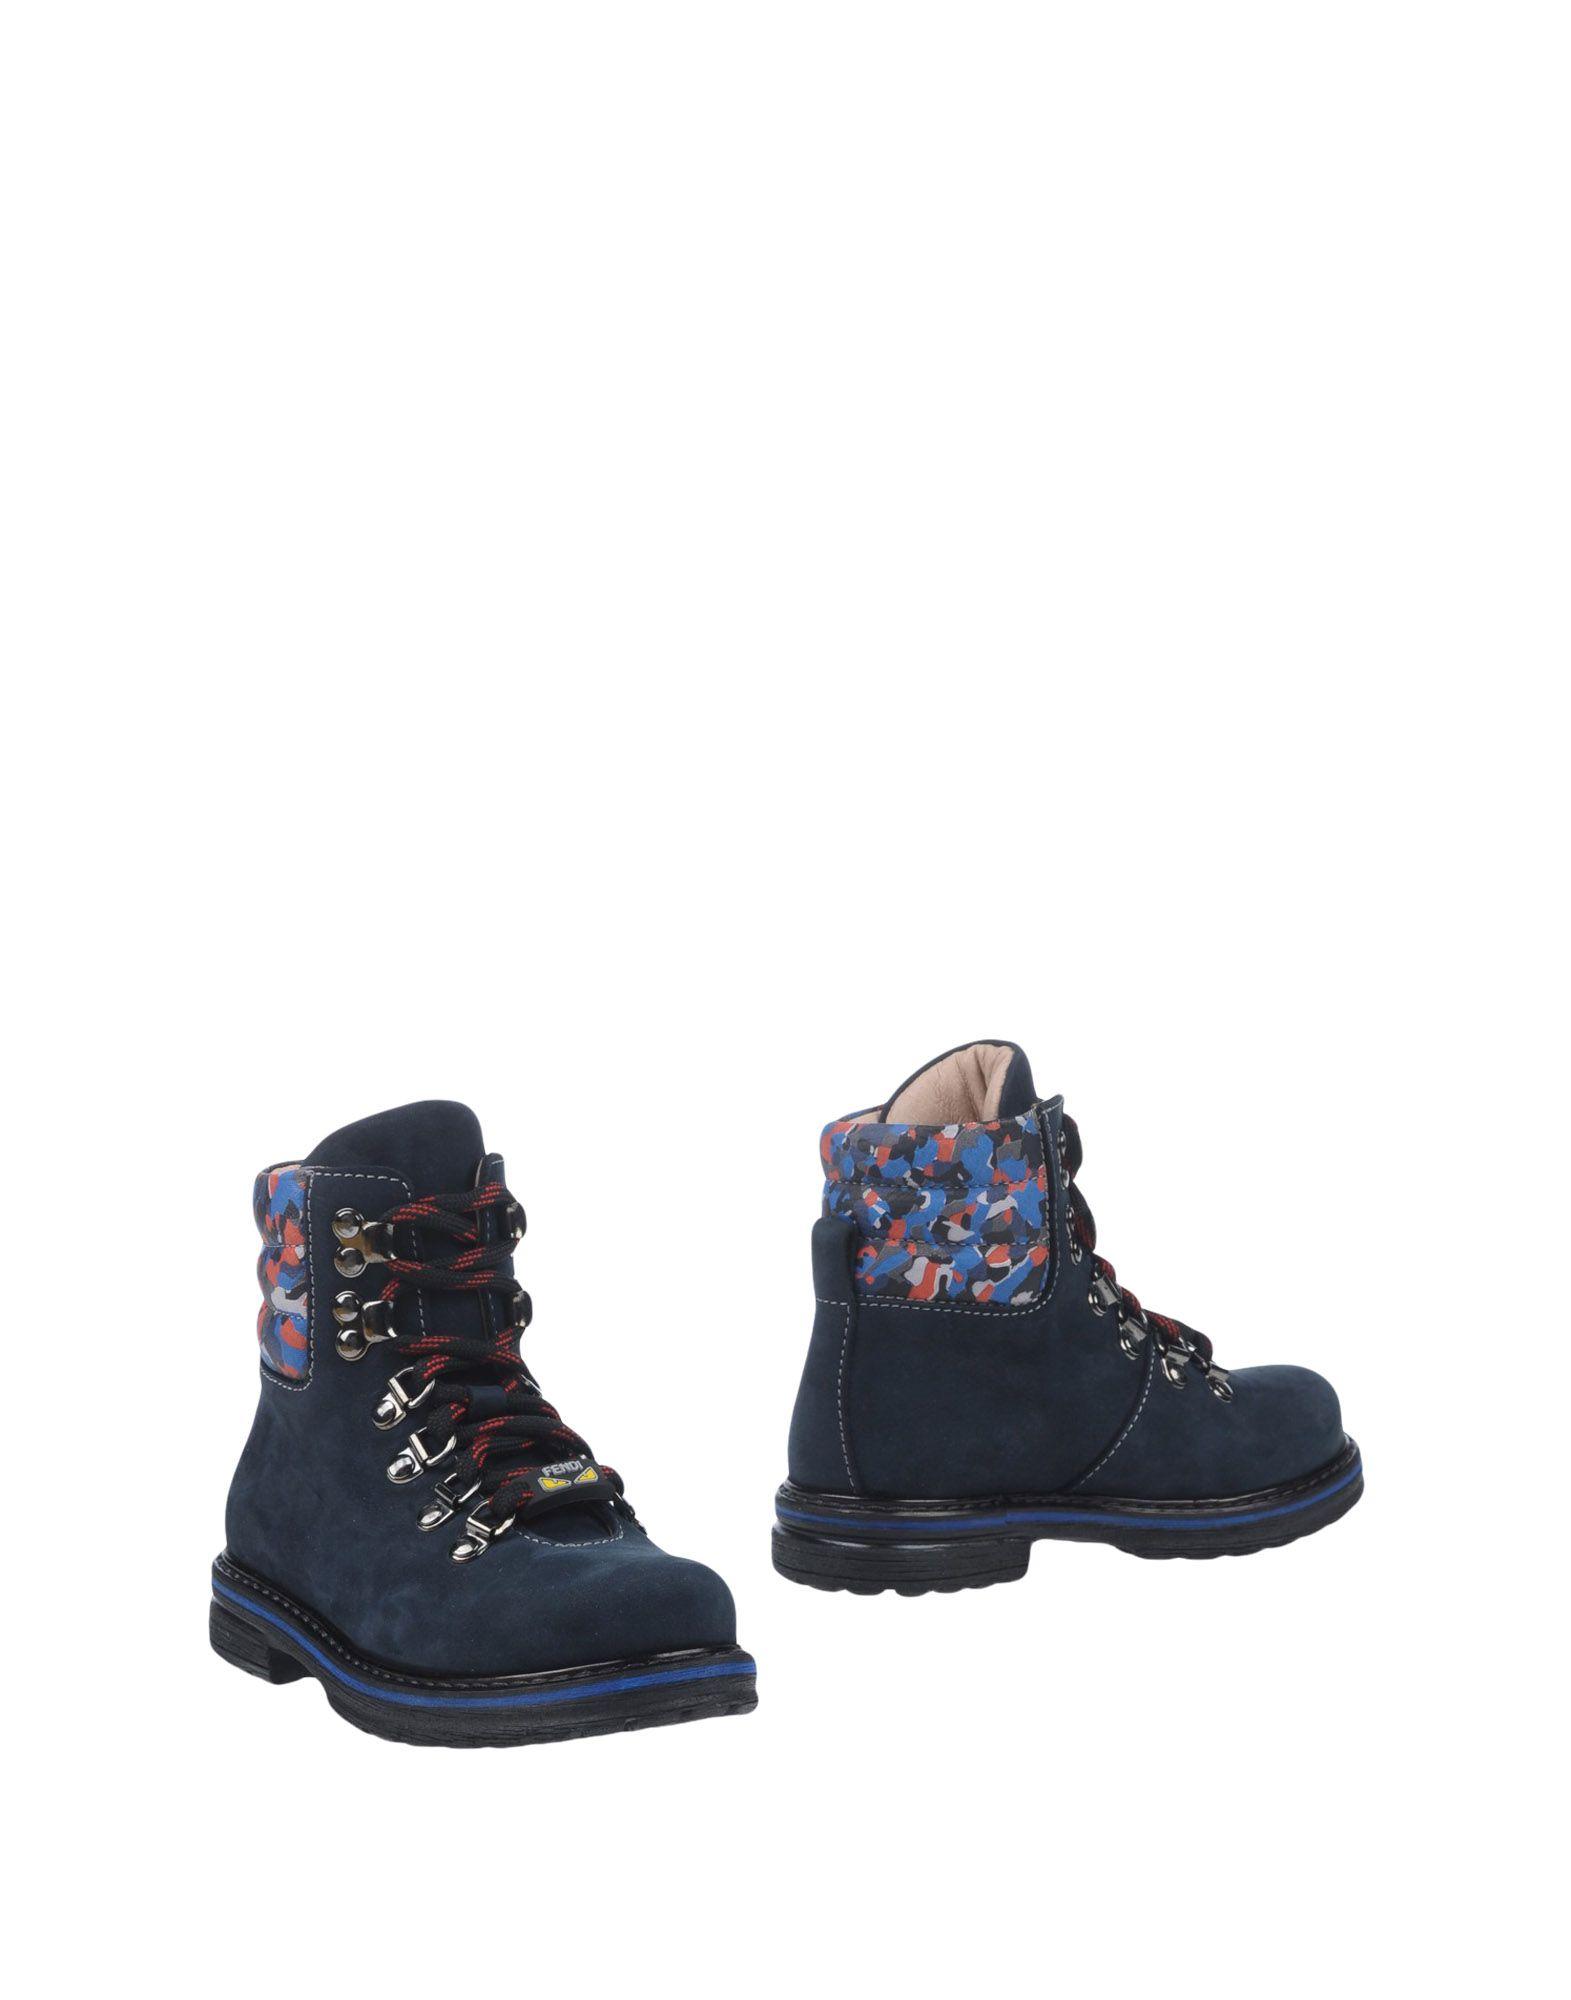 FENDI Полусапоги и высокие ботинки magazzini del sale полусапоги и высокие ботинки